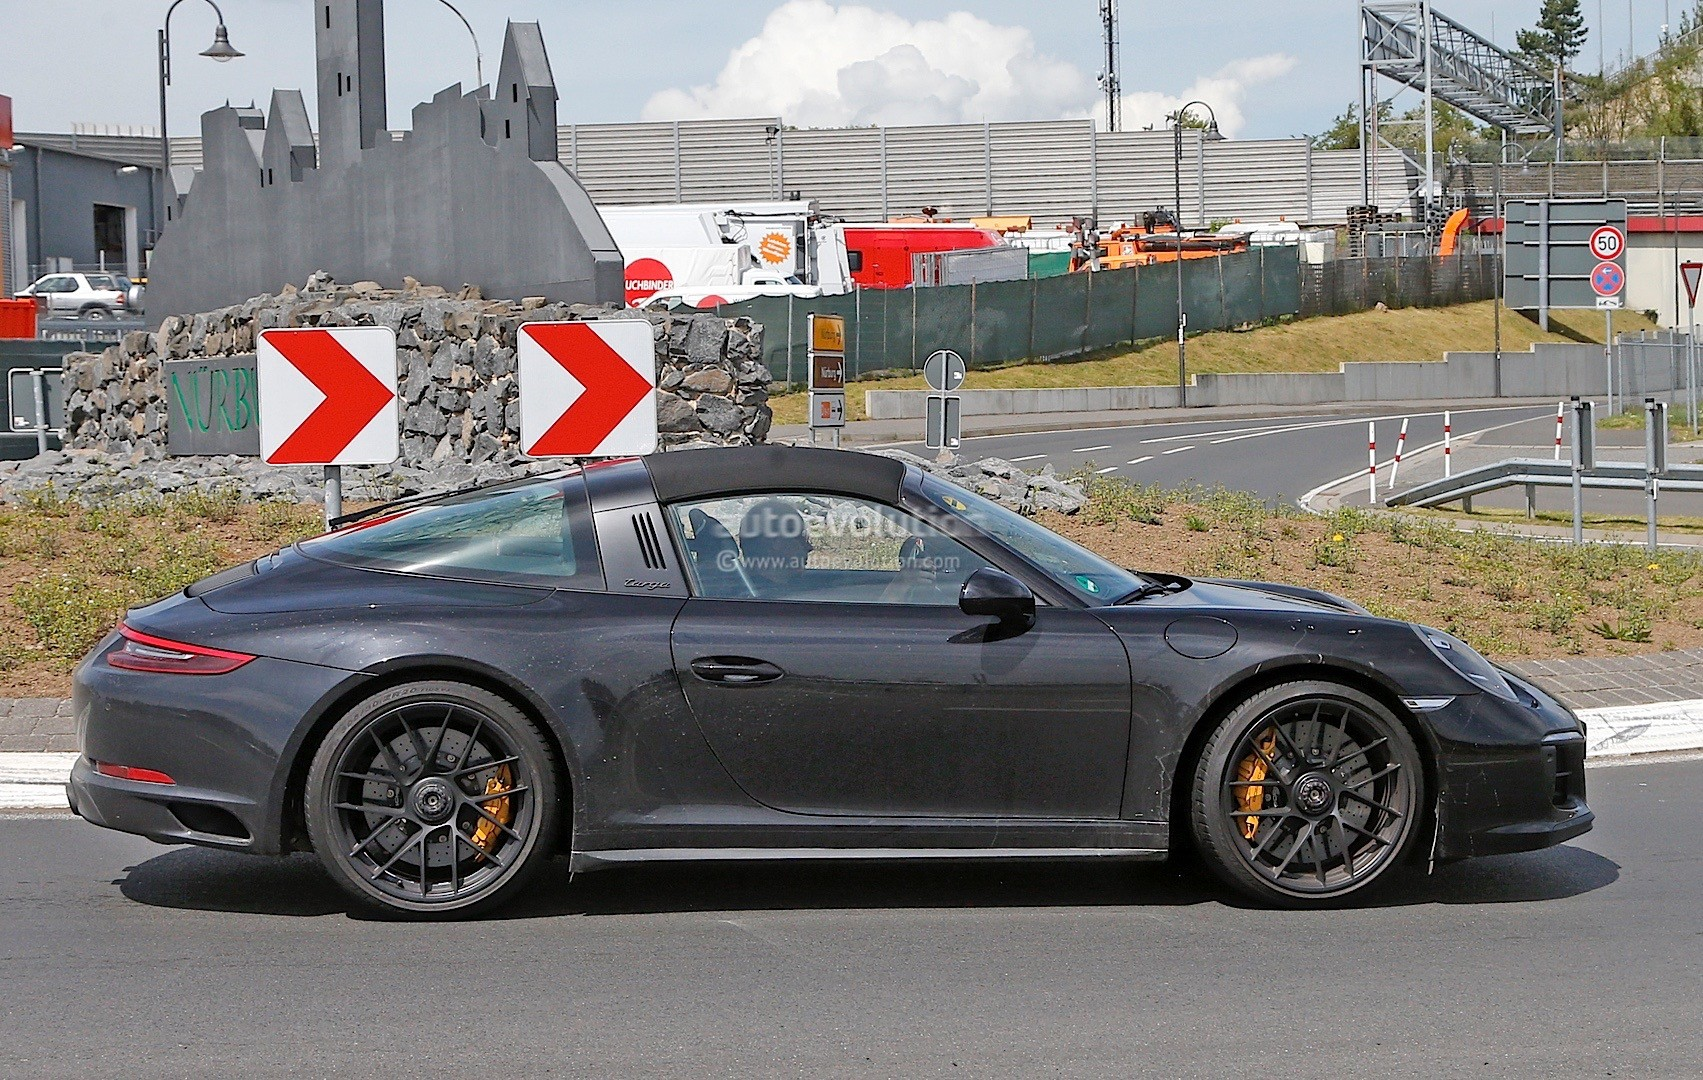 2017 Porsche 911 Targa Gts 991 2 Spied Near The